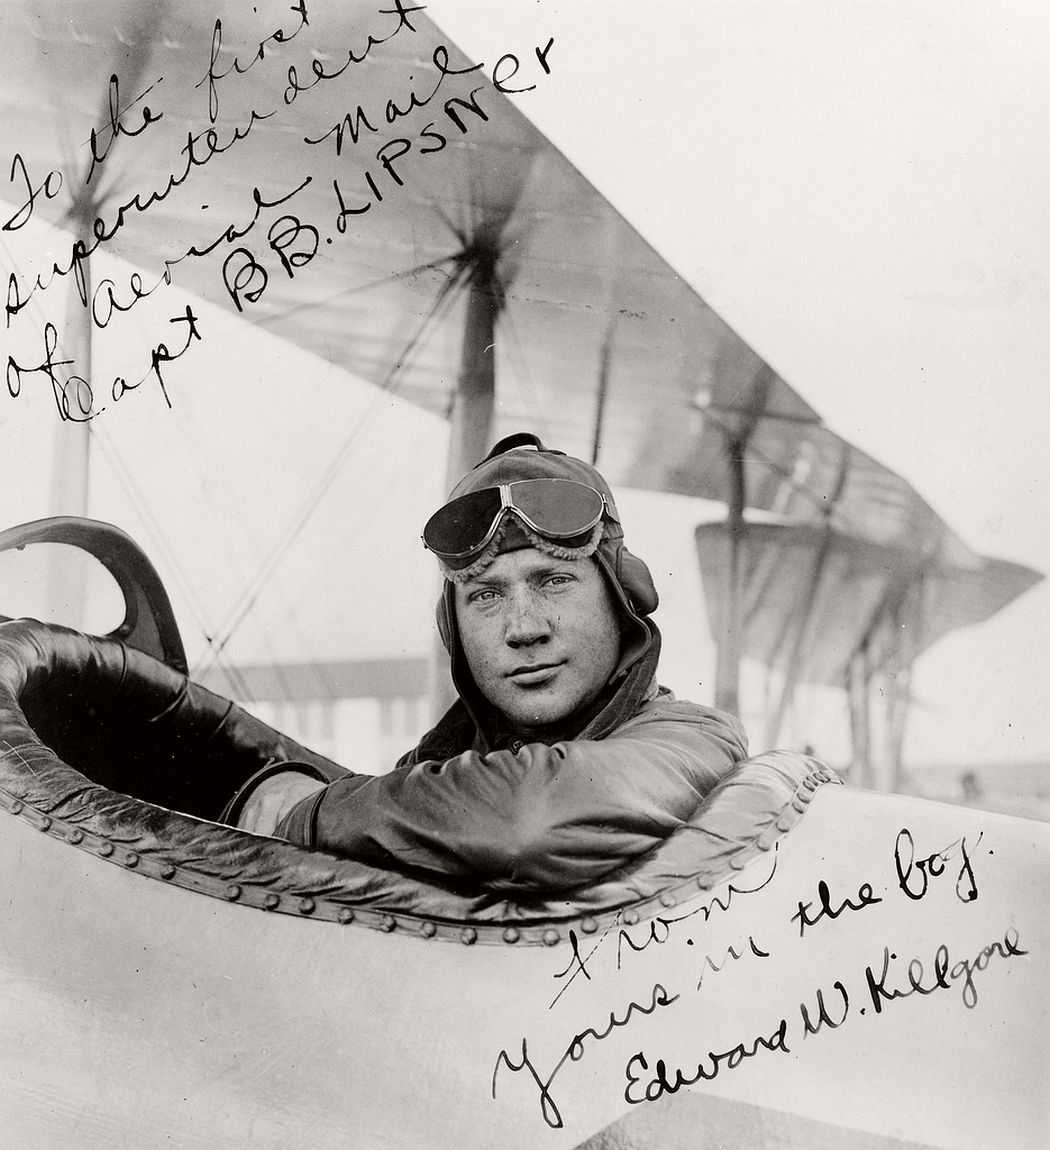 Airmail pilot Edward Killgore, 1918